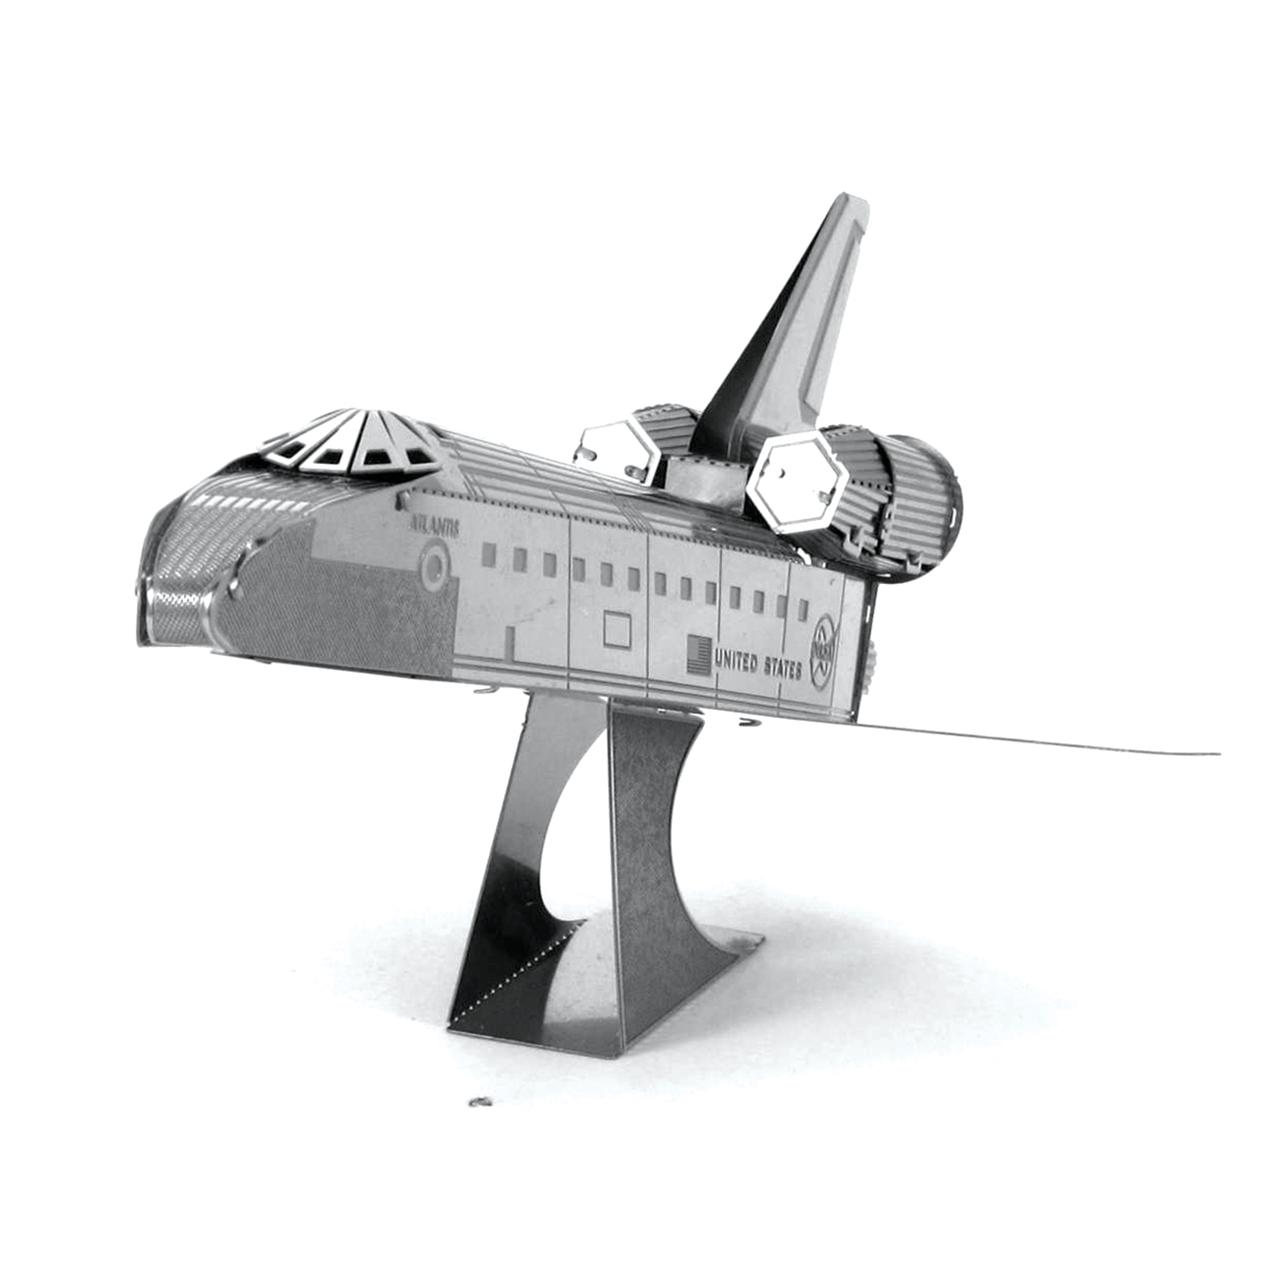 space shuttle atlantis toy - photo #36